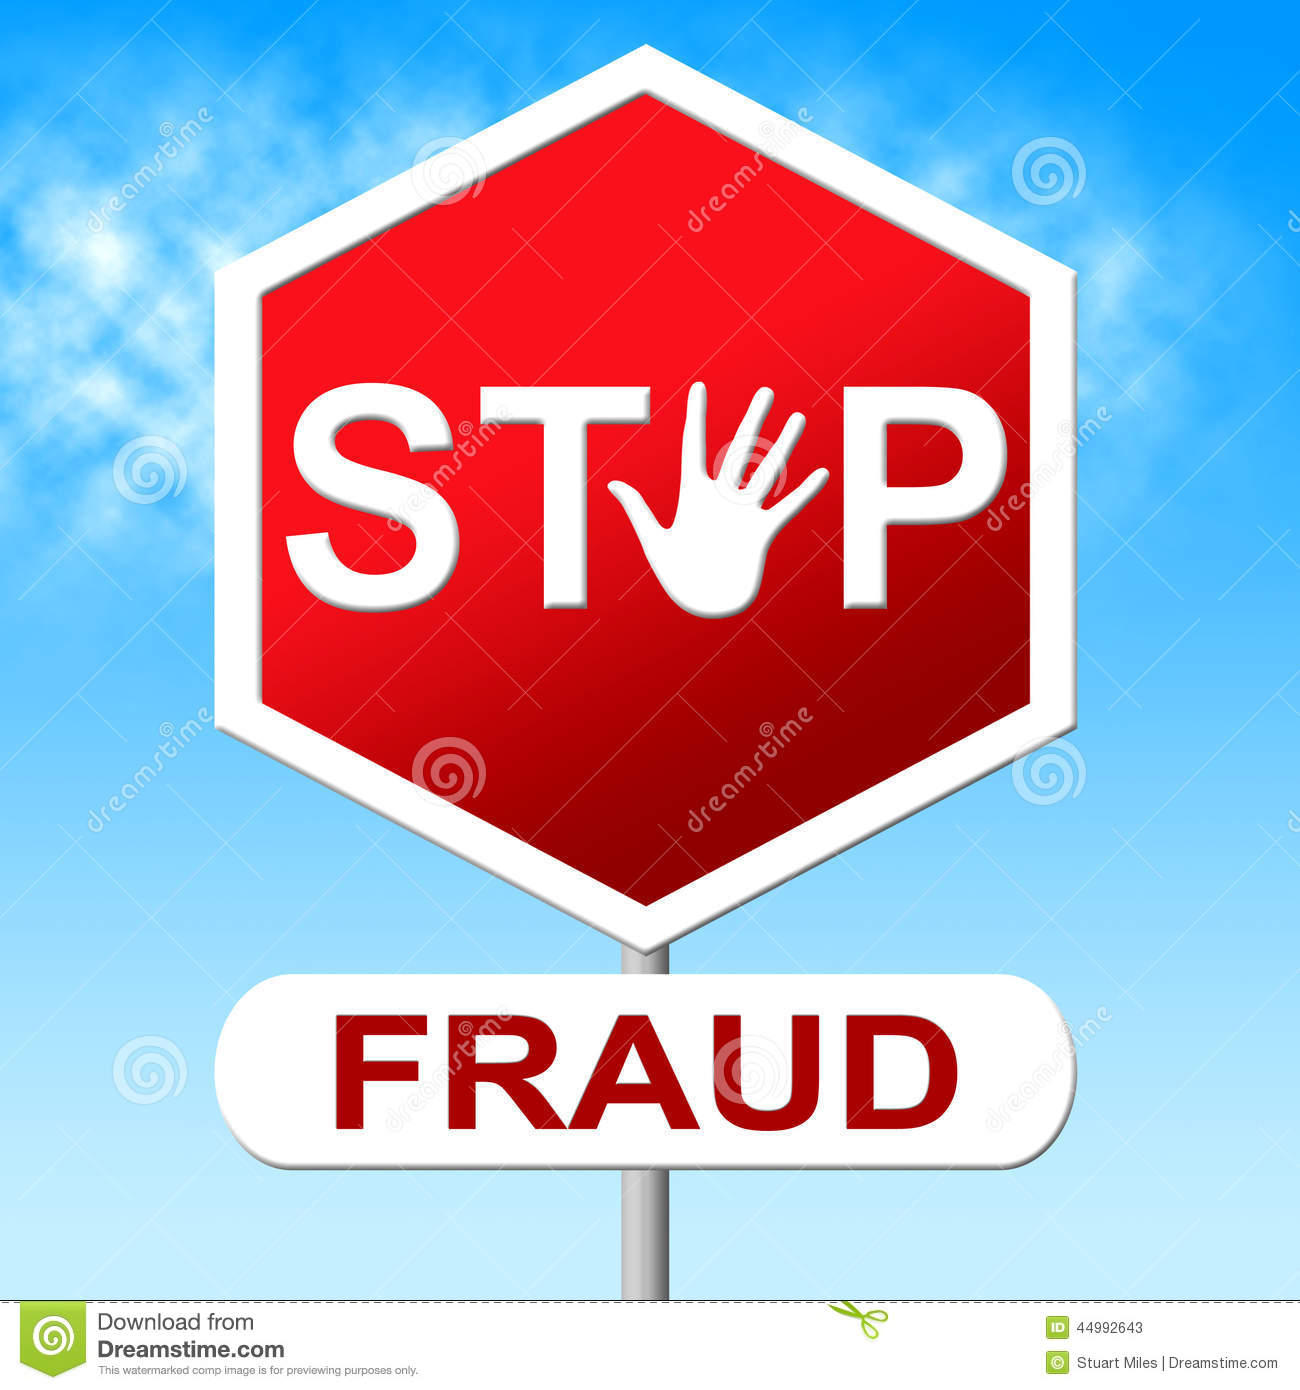 Fraud Clip Art | Clipart Panda - Free Clipart Images